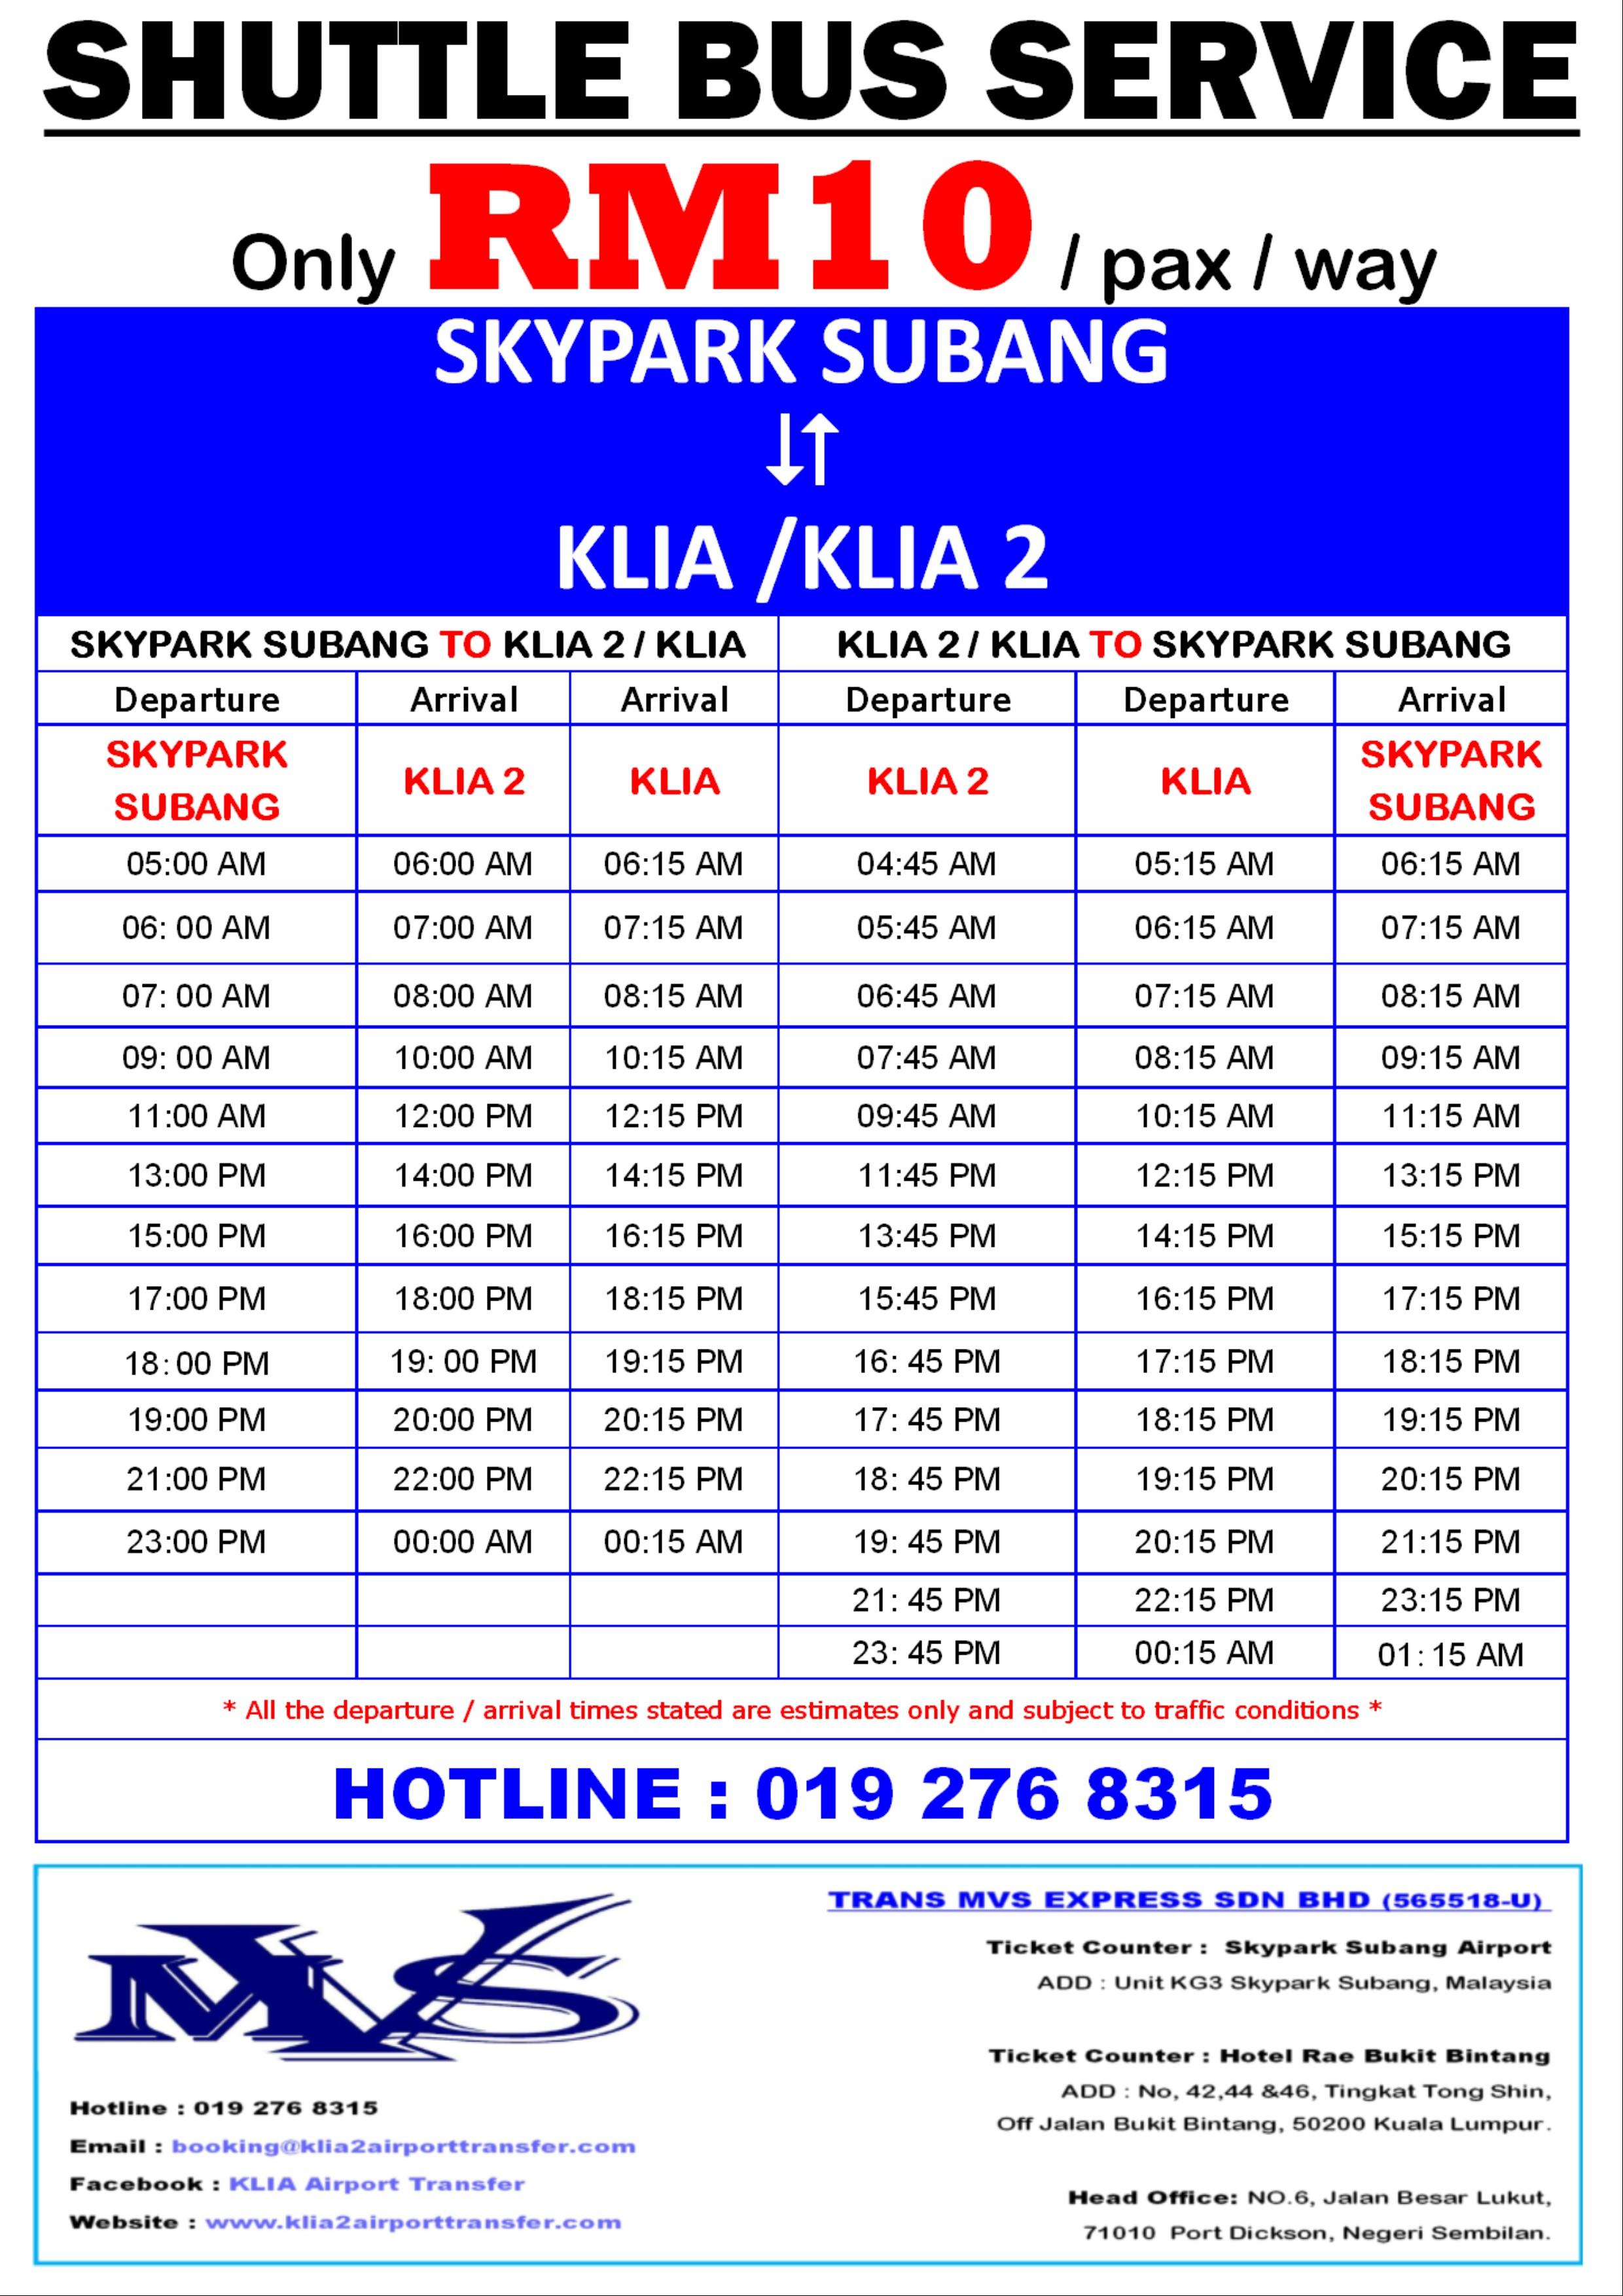 аэропорт субанг куала лумпру как добраться